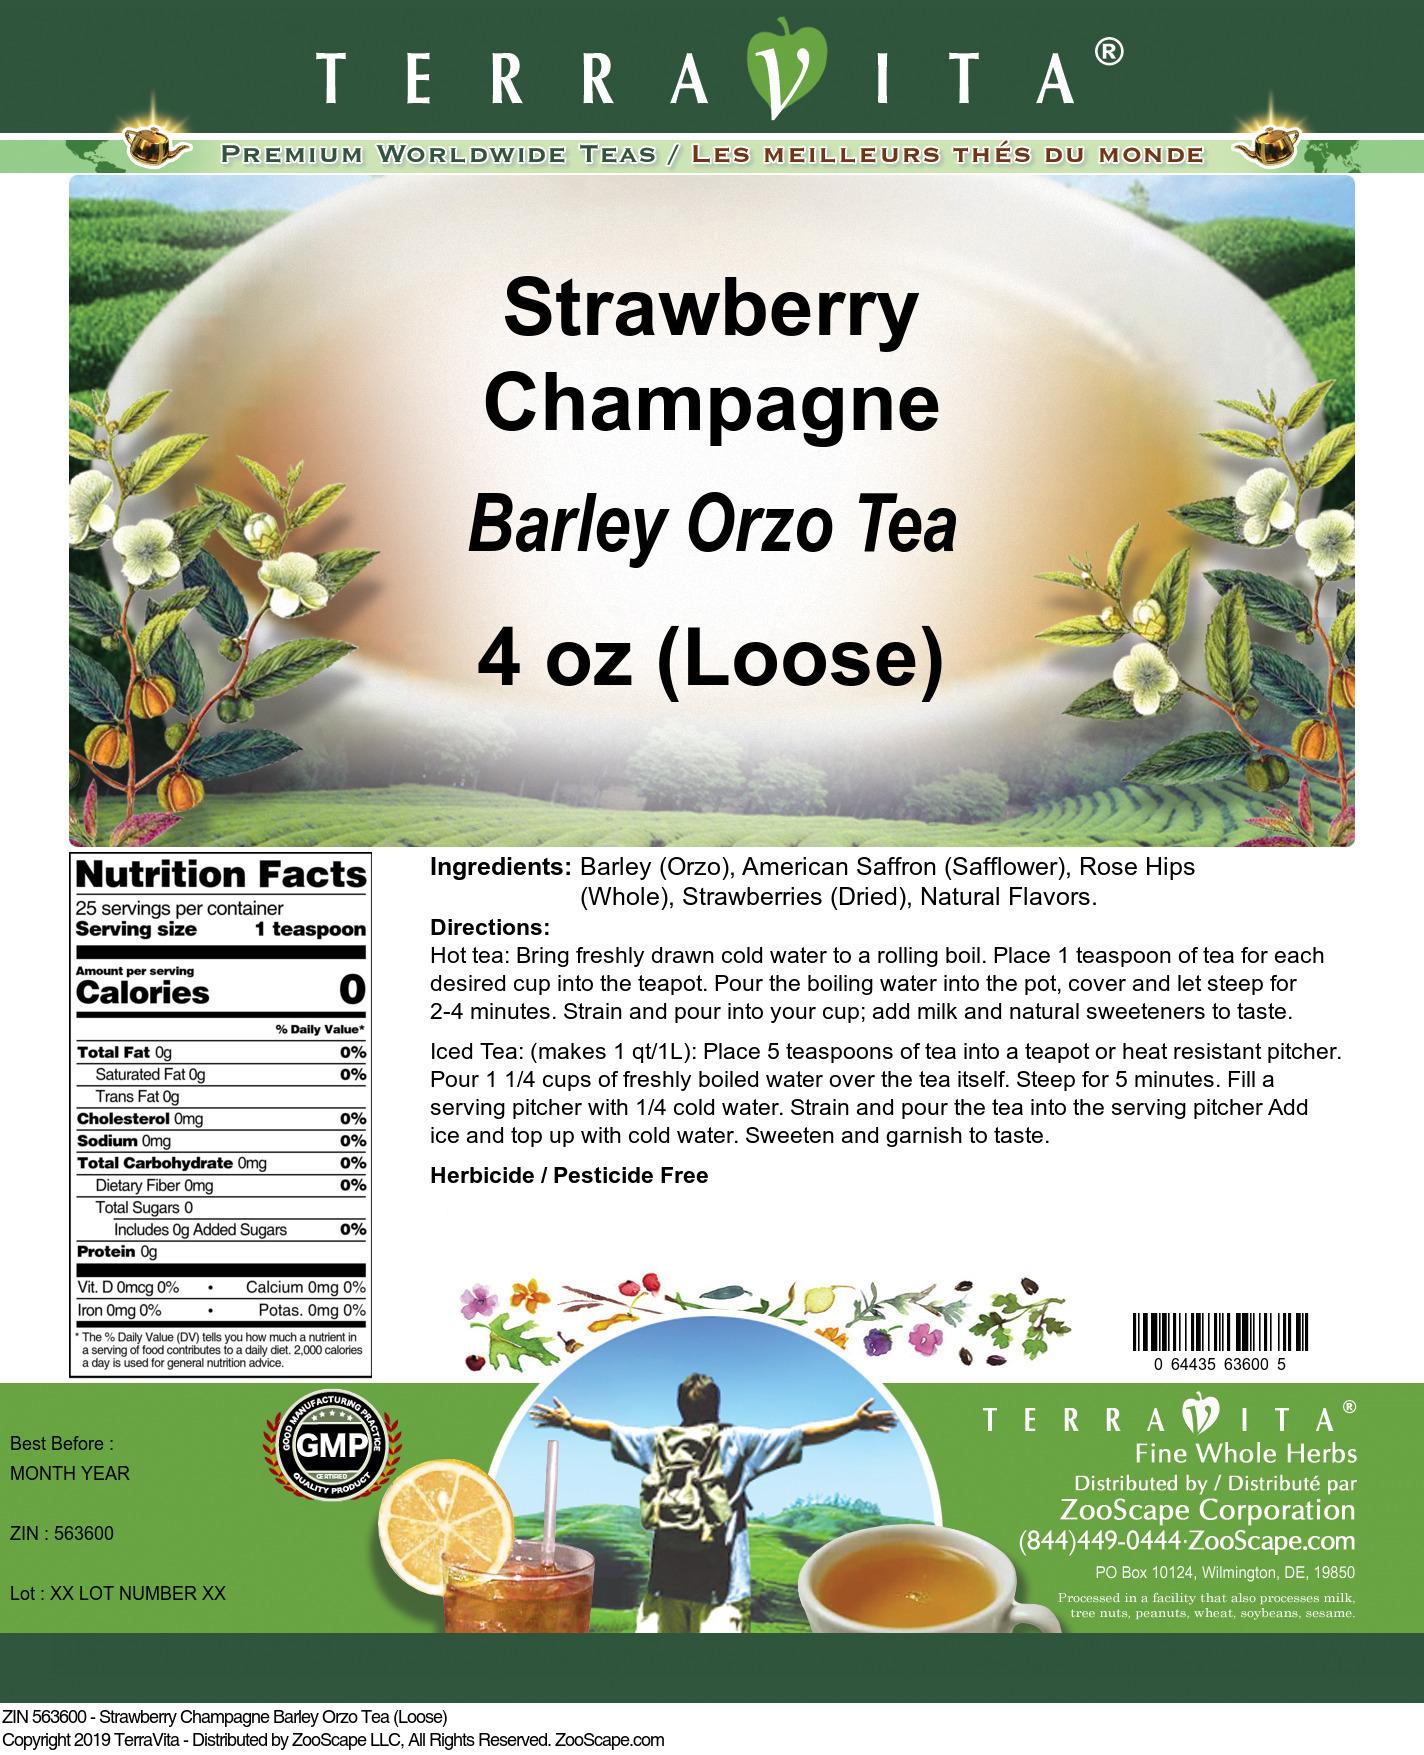 Strawberry Champagne Barley Orzo Tea (Loose)